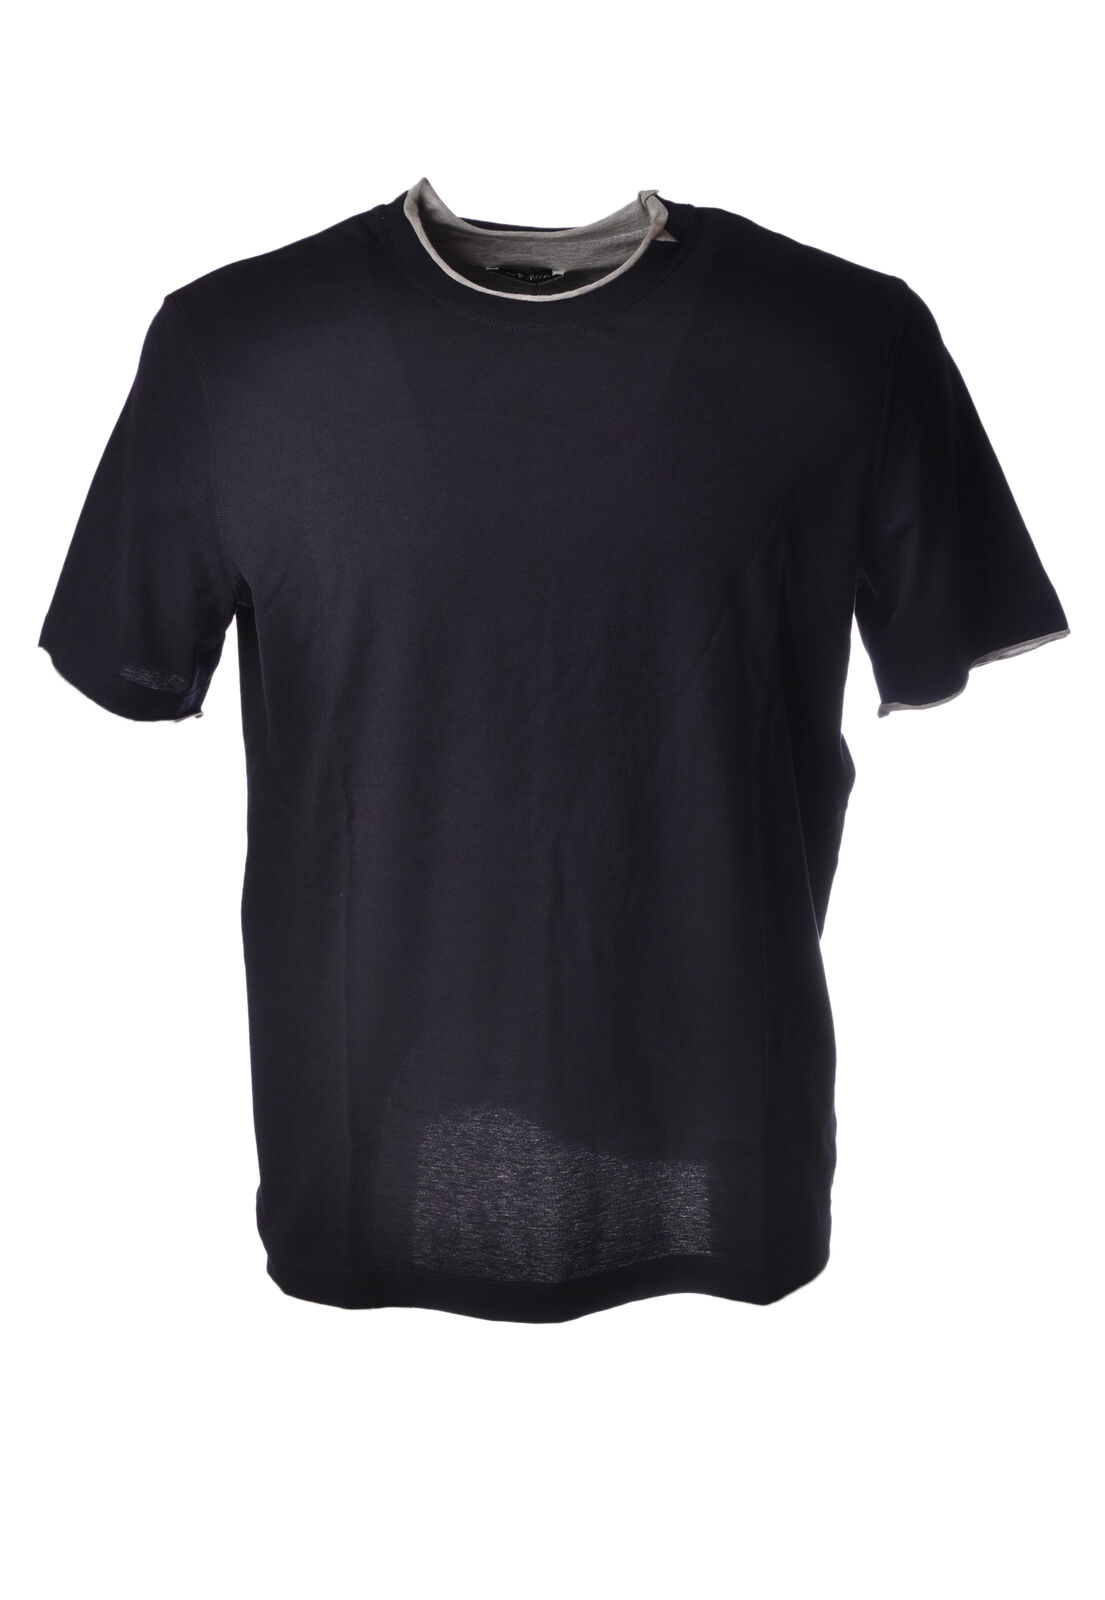 Paolo Pecora - Topwear-T-shirts - Mann - blue - 5038426E183616